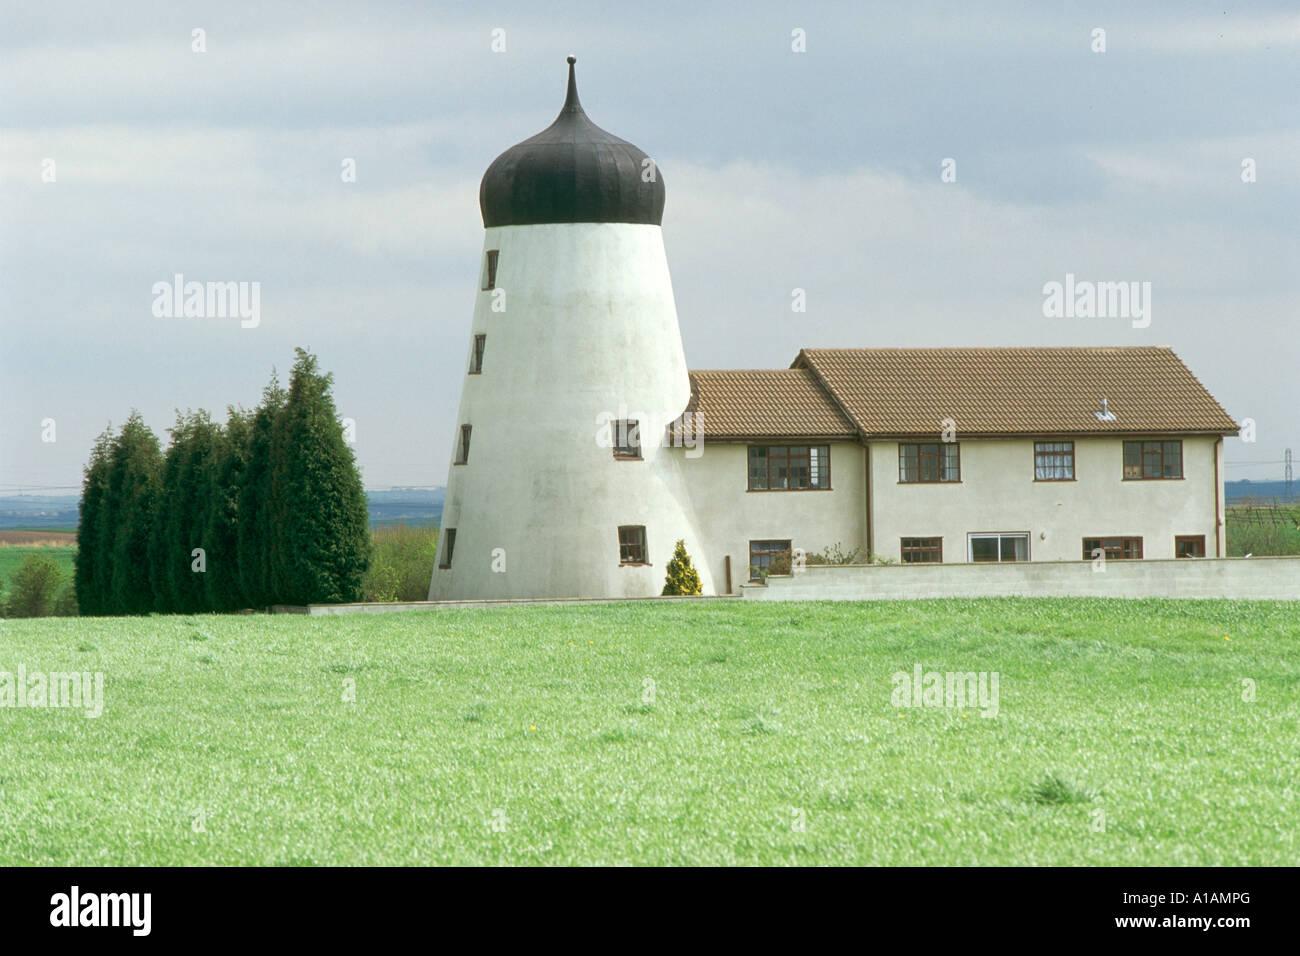 A huge white windmill Isle of Axholme - Stock Image